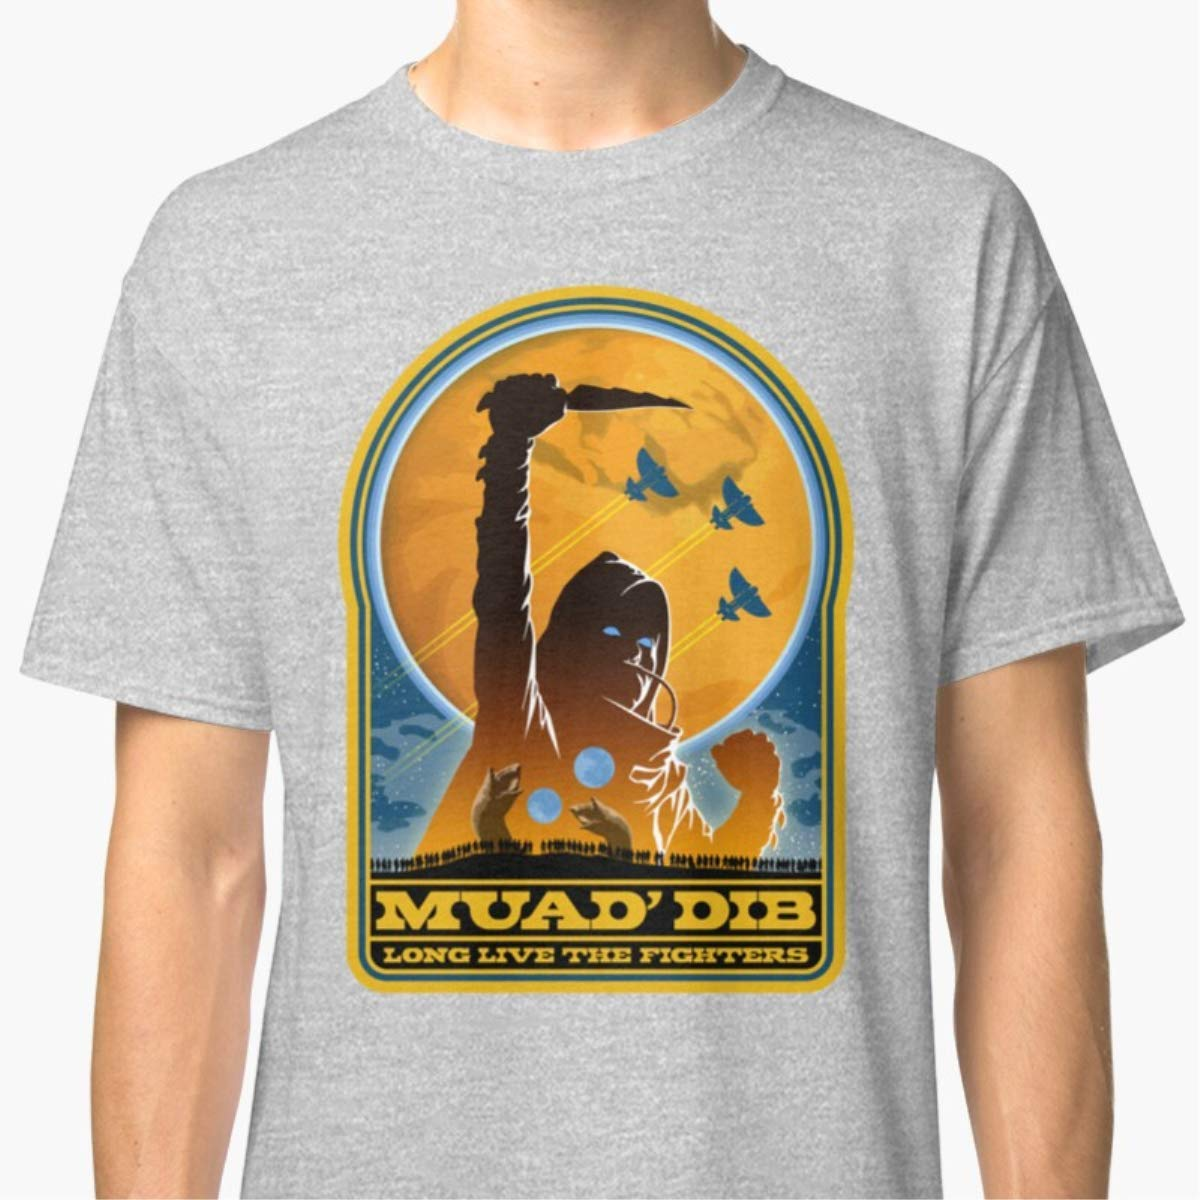 Unisex T-Shirt Dune MUAD DIB Shirts For Men Women Mon Cool Neck